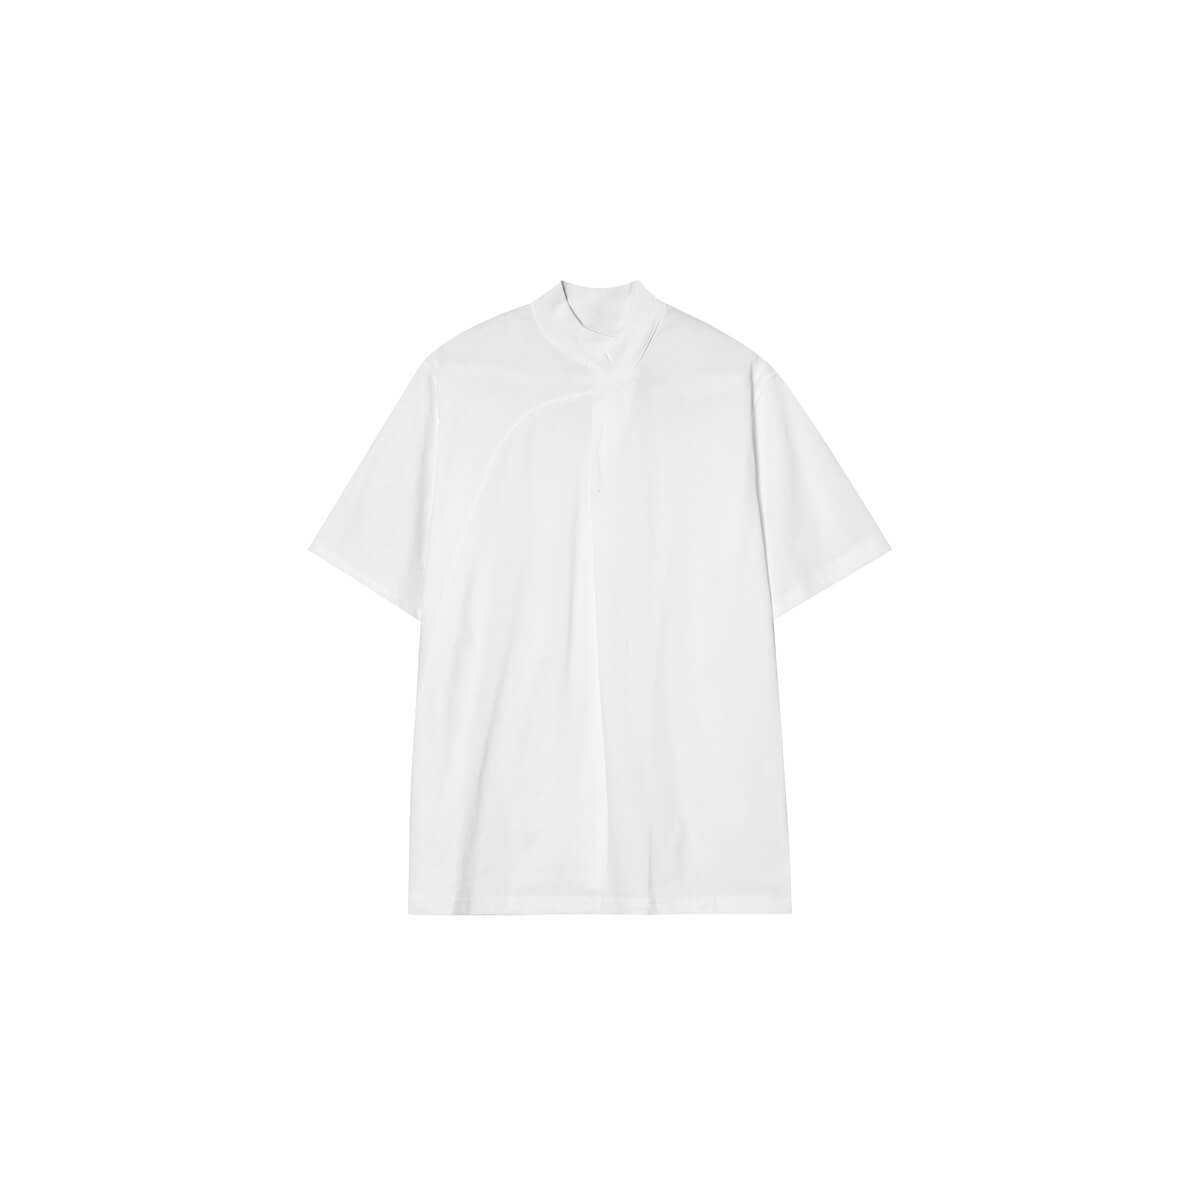 Футболка Cui Layout Studio Minimalist T-shirt Padded Rounded Collar White